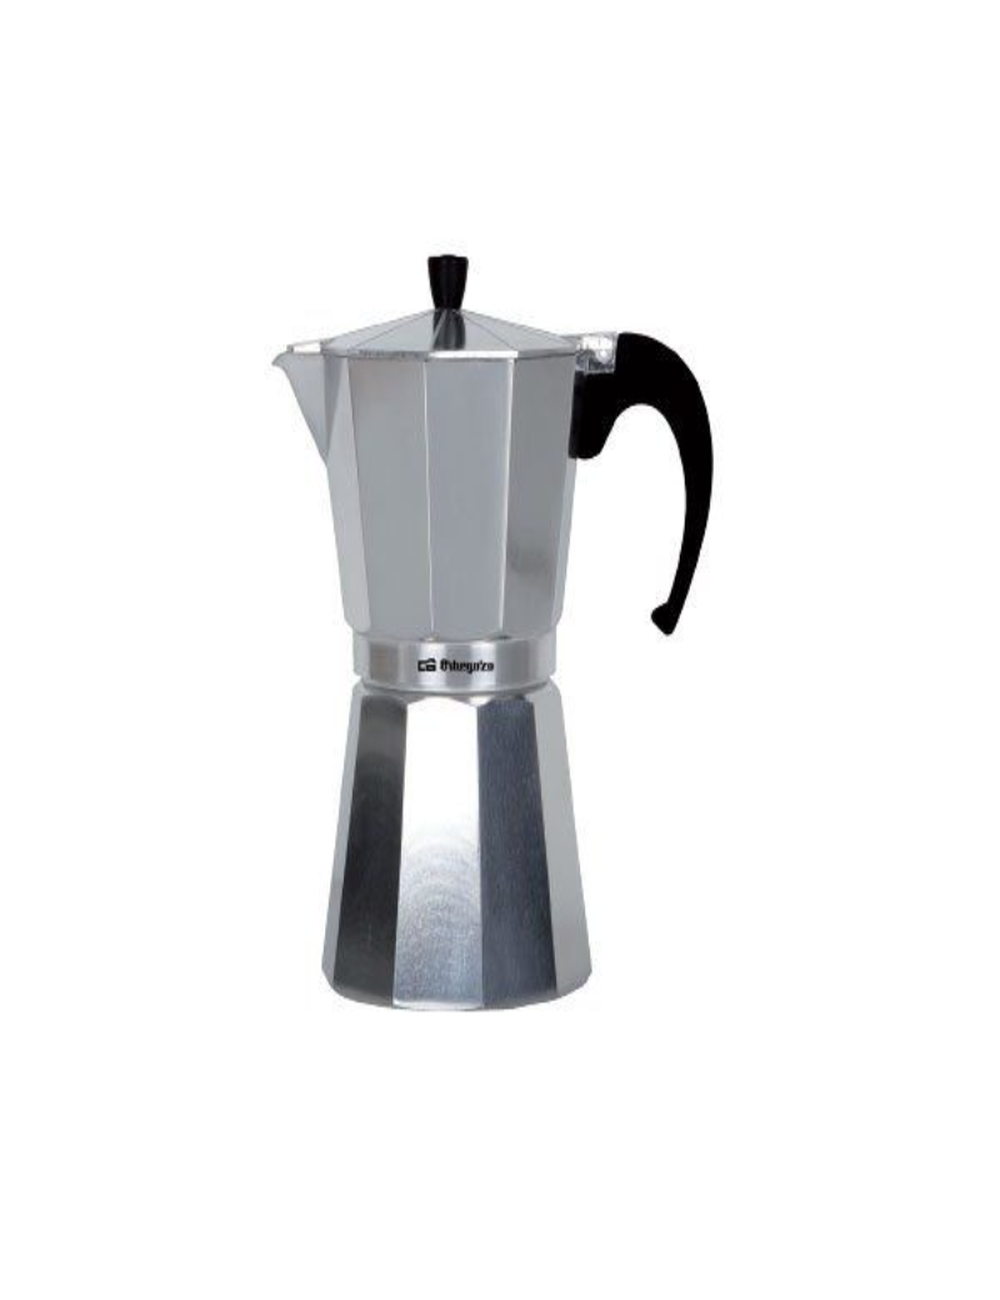 Cafetera de aluminio ORBEGOZO KF-1200